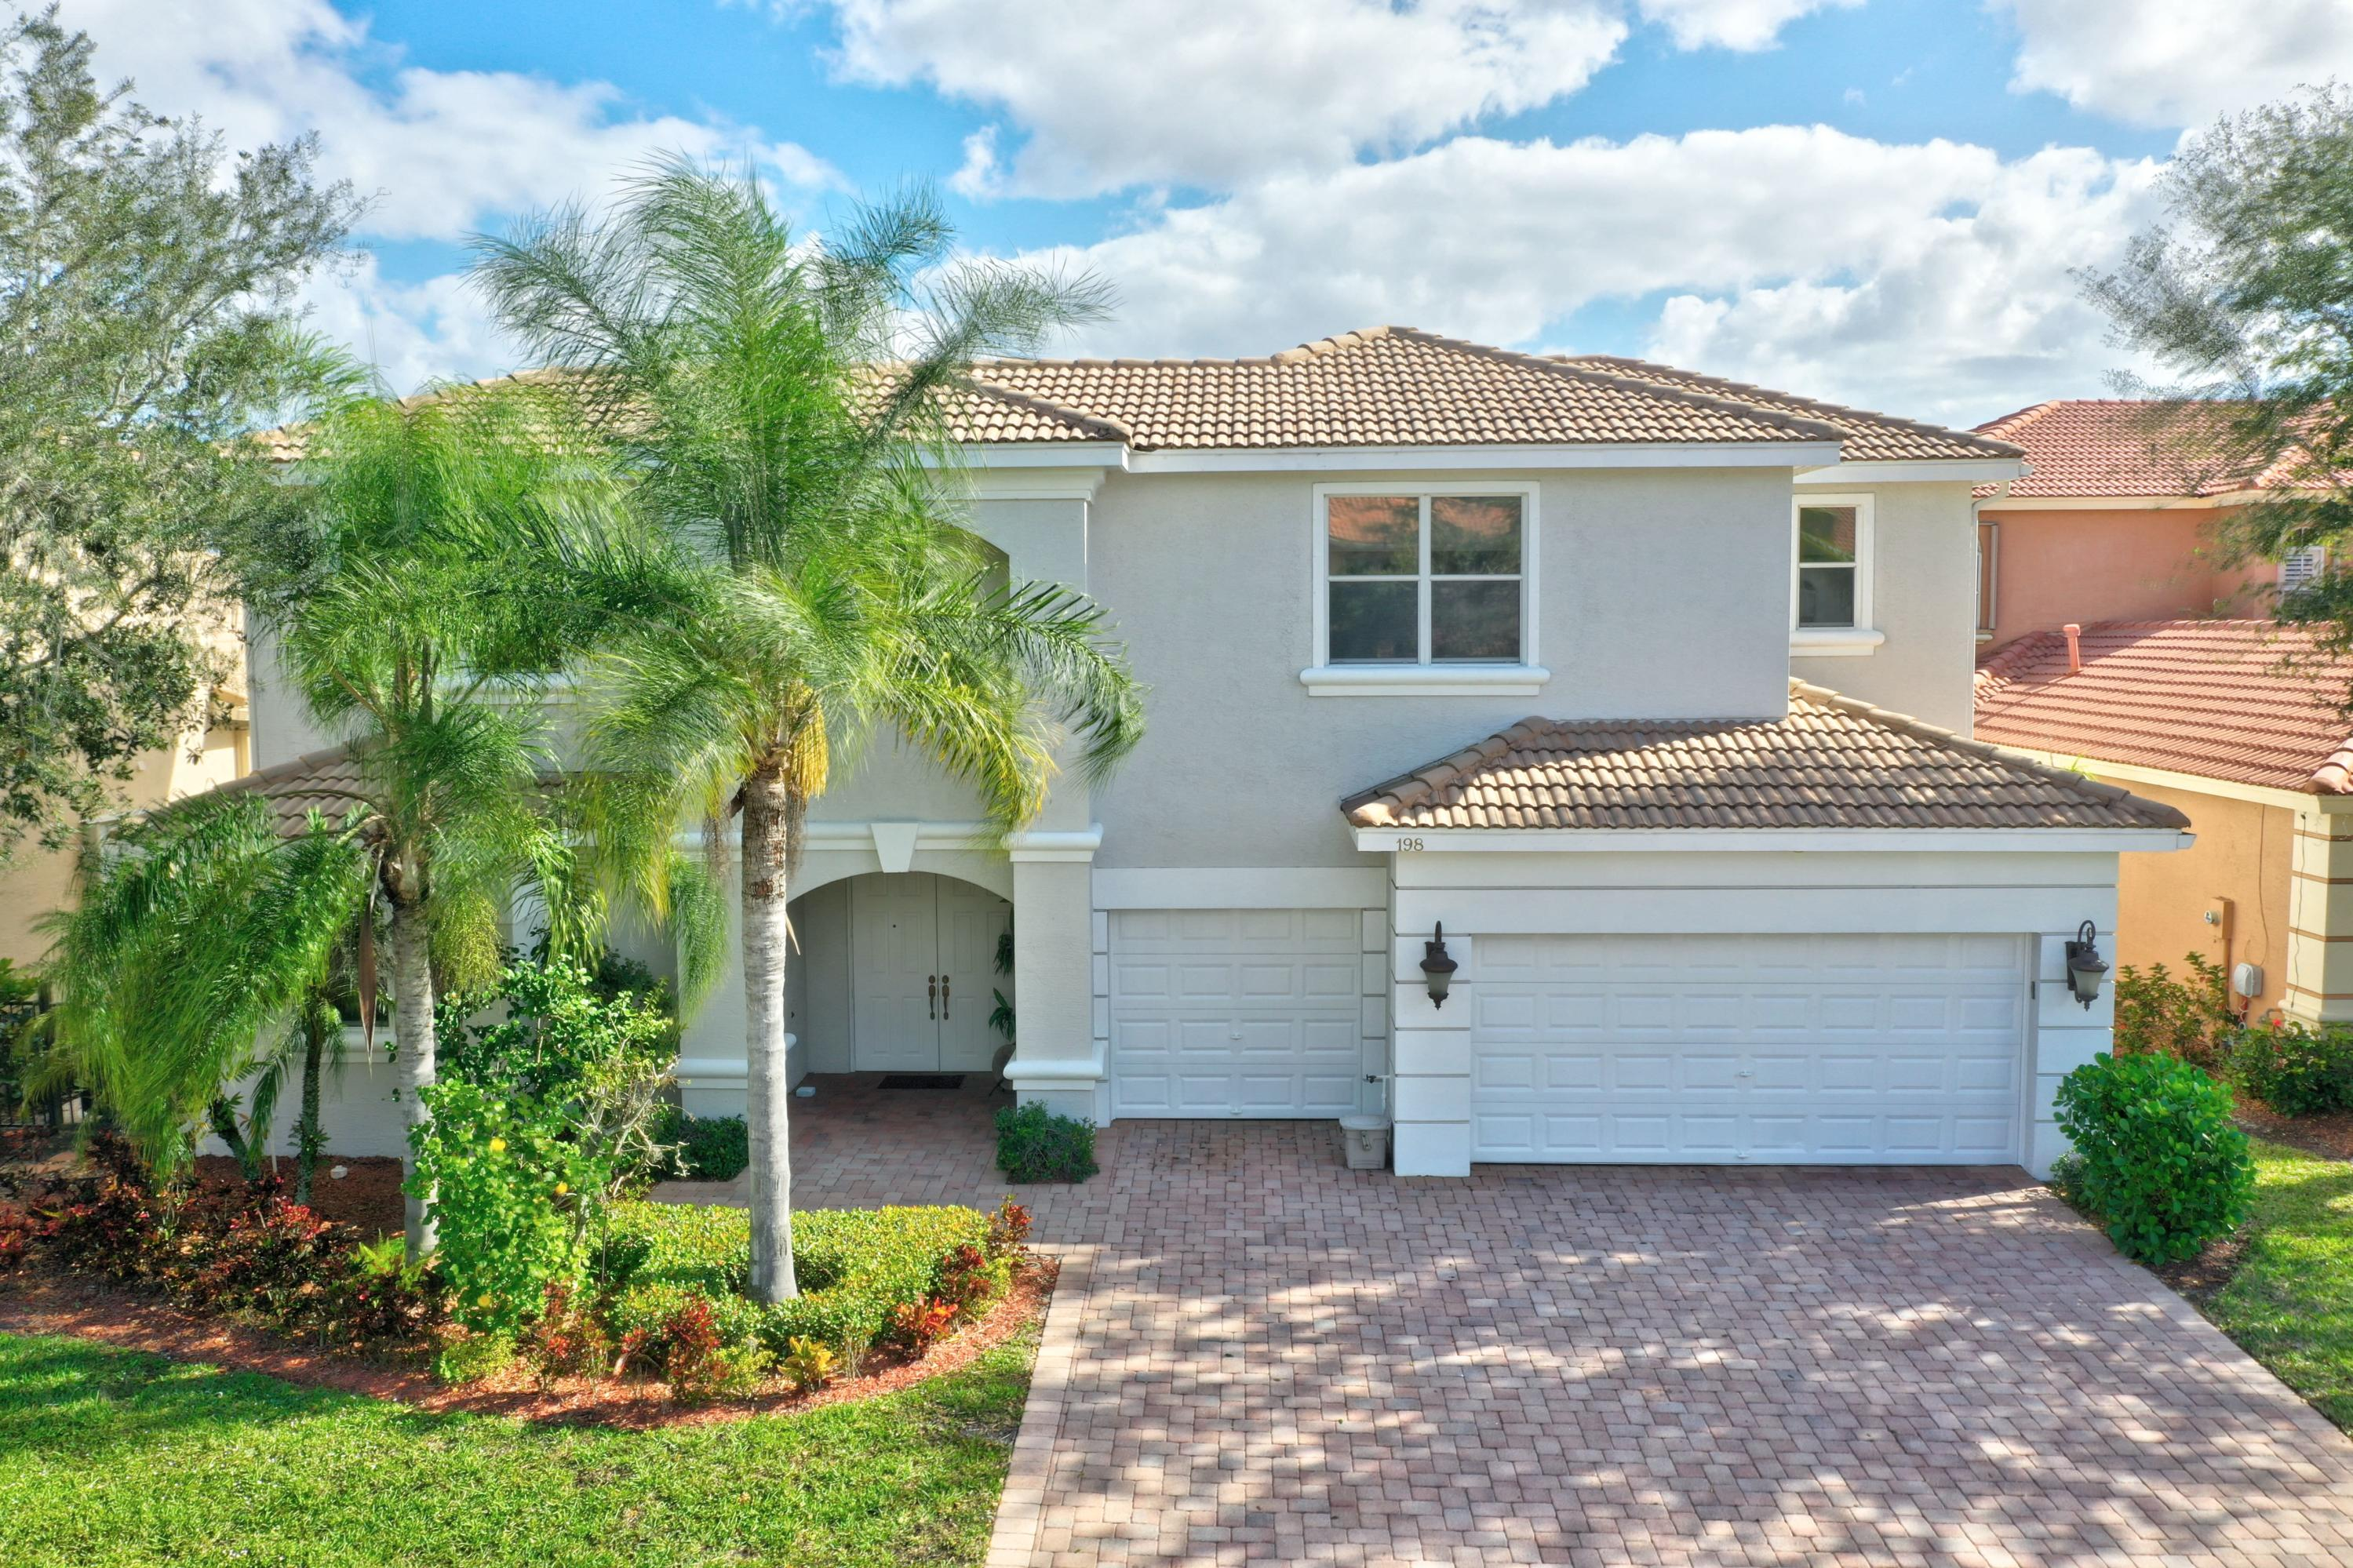 198 Sedona Way, Palm Beach Gardens, Florida 33418, 5 Bedrooms Bedrooms, ,4.1 BathroomsBathrooms,A,Single family,Sedona,RX-10592555